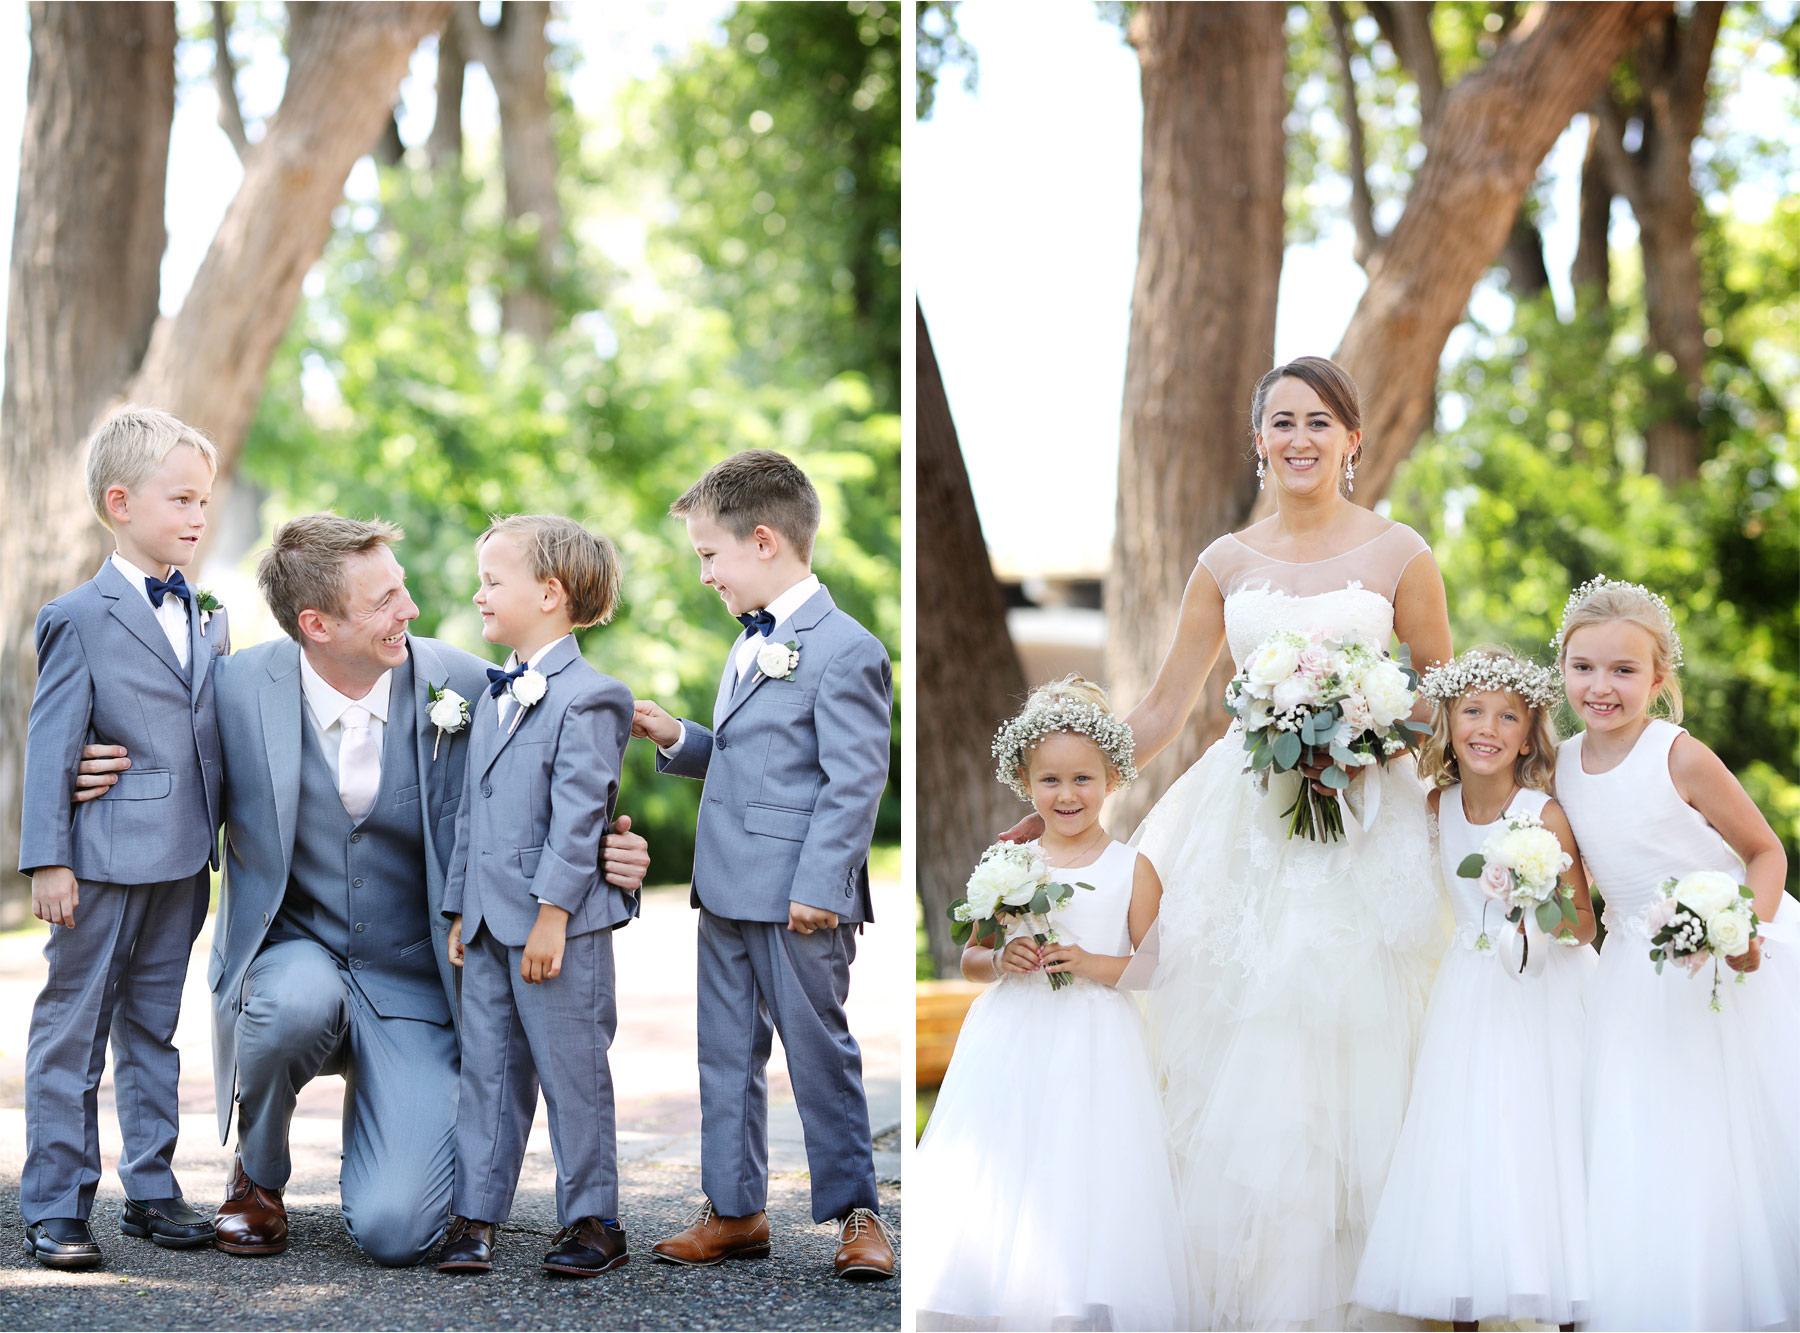 09-Minneapolis-Minnesota-Wedding-Photography-by-Vick-Photography-Saint-Anthony-Main-Flower-Girls-Tux-Brigid-and-Ernie.jpg